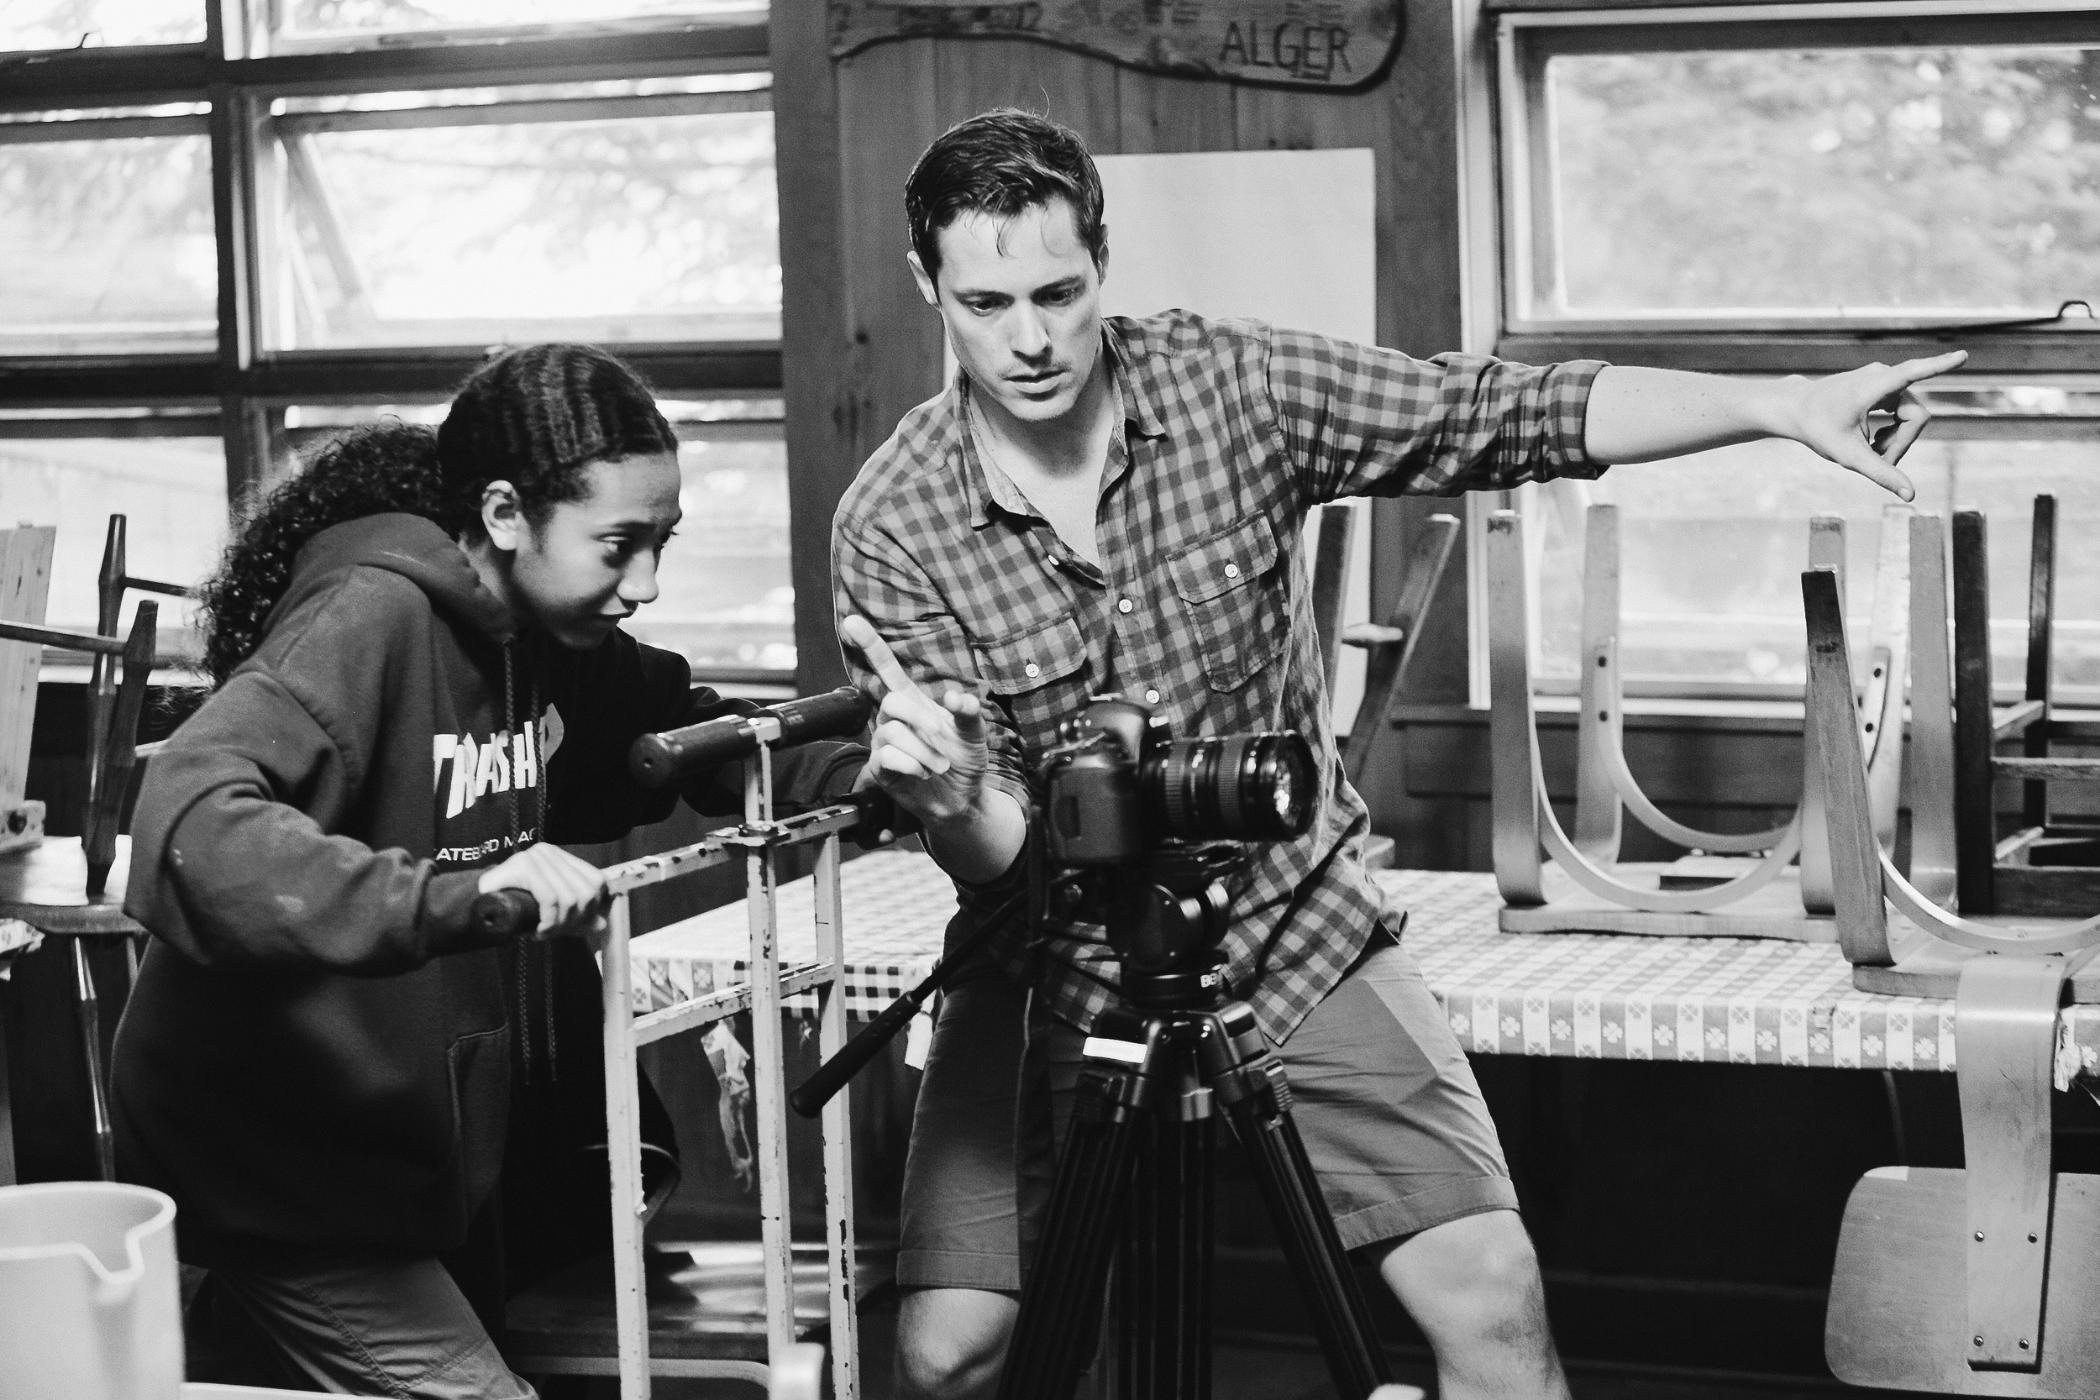 WAYNE BETTS FILMMAKER / LEAD TEACHER